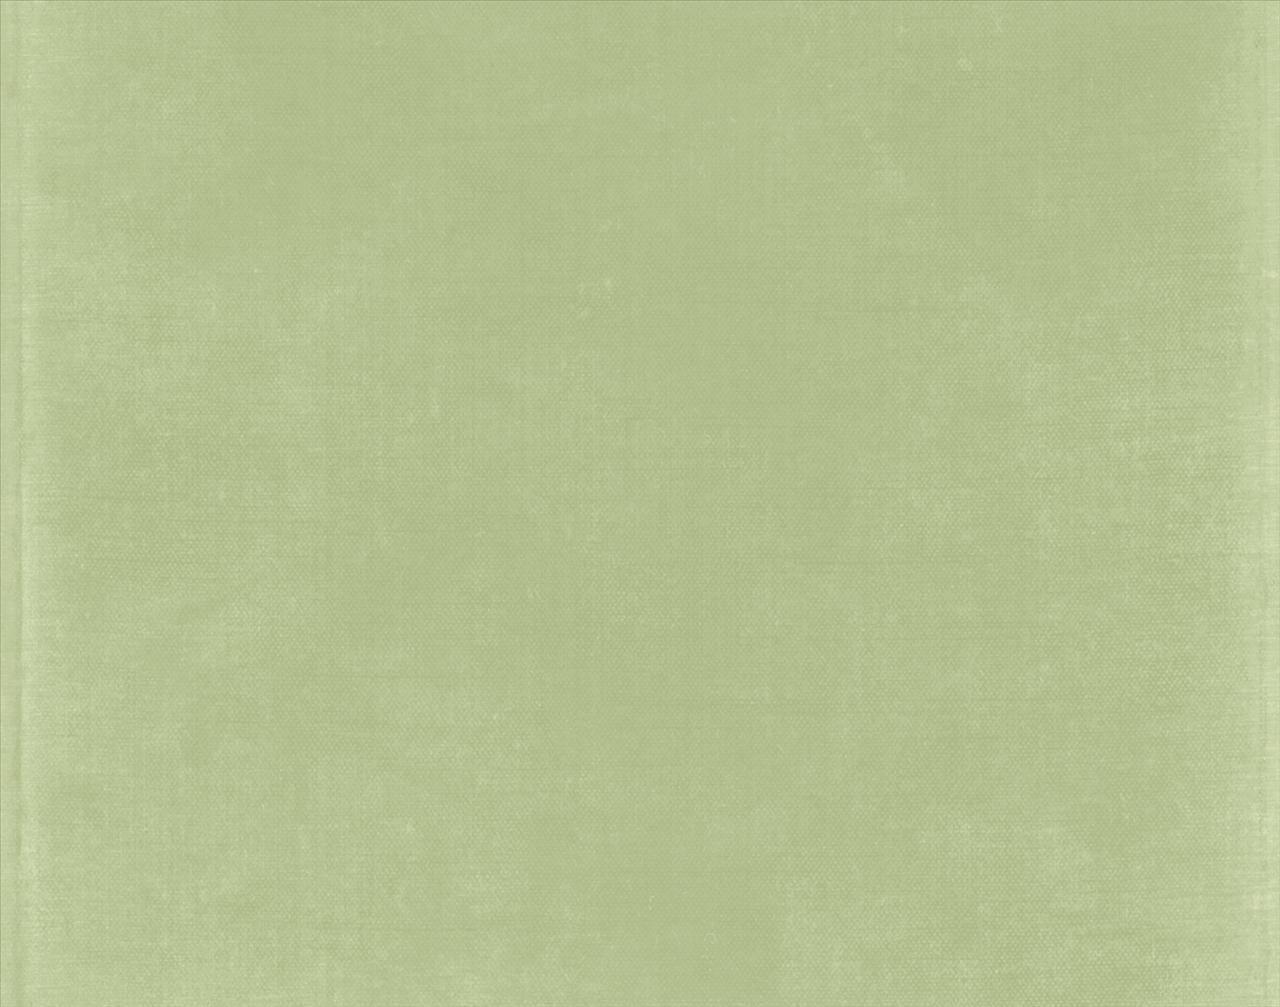 Sage Green Desktop Wallpapers Top Free Sage Green Desktop Backgrounds Wallpaperaccess